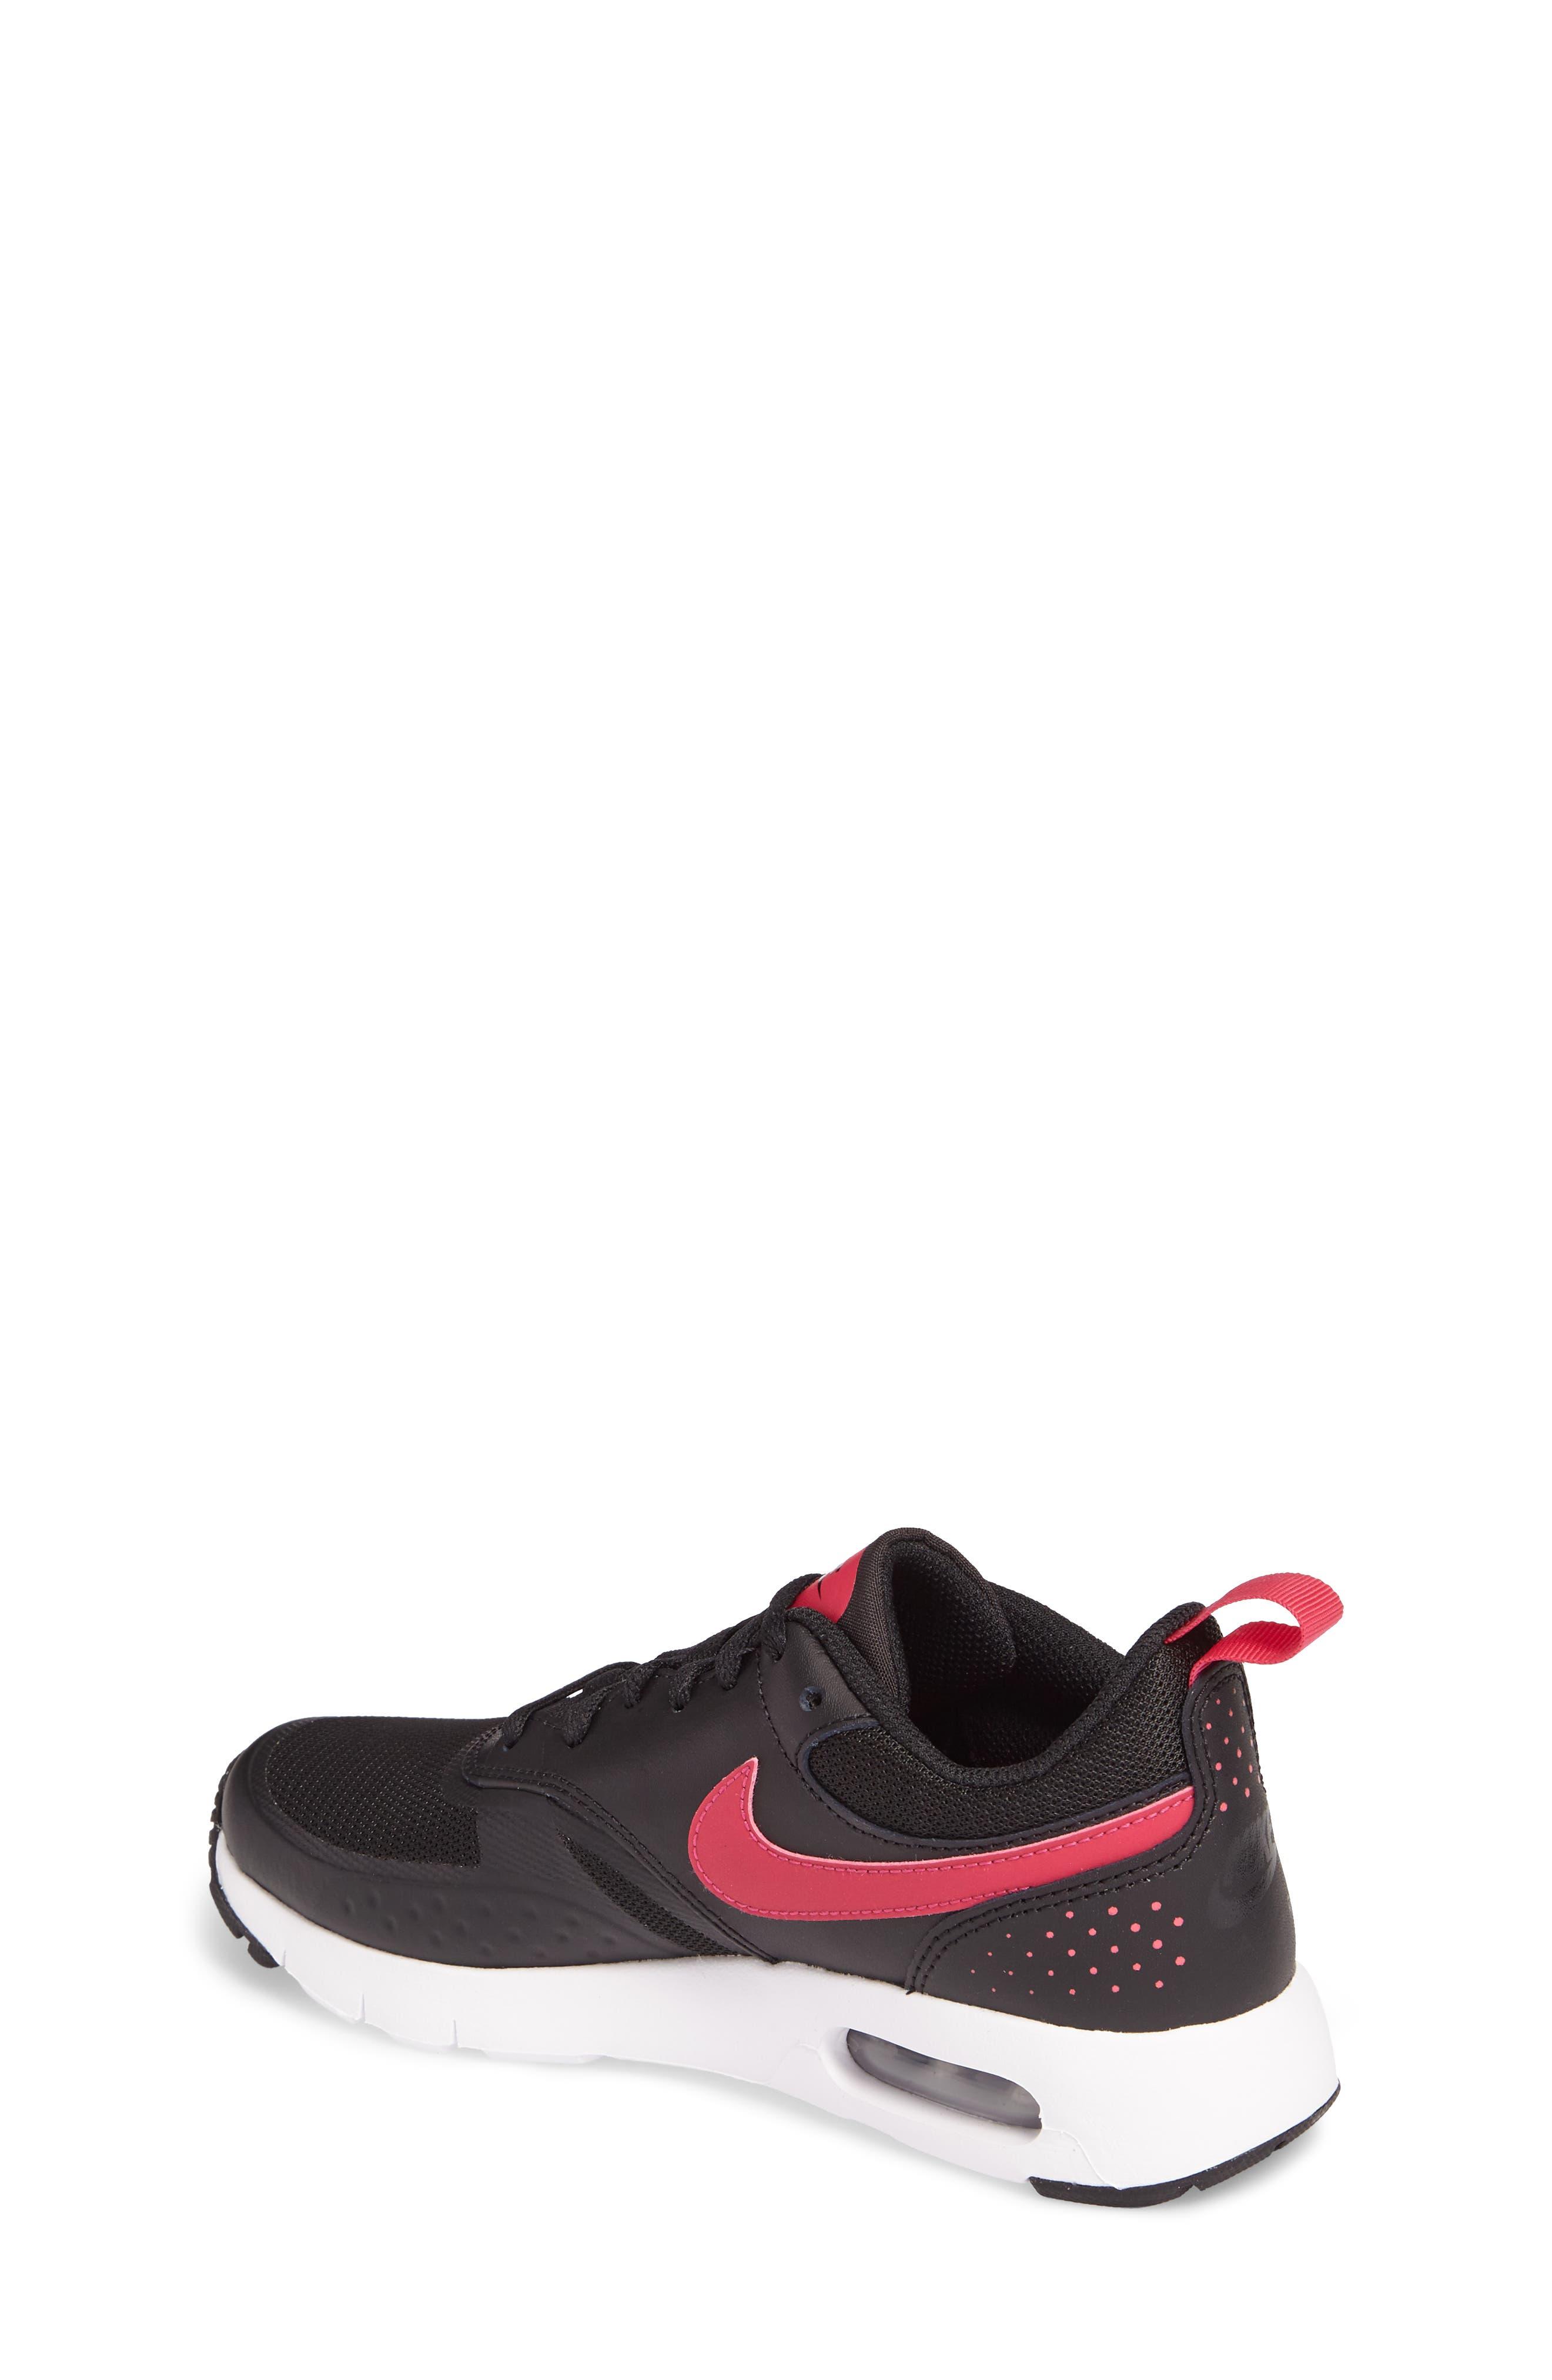 Air Max Vision Sneaker,                             Alternate thumbnail 4, color,